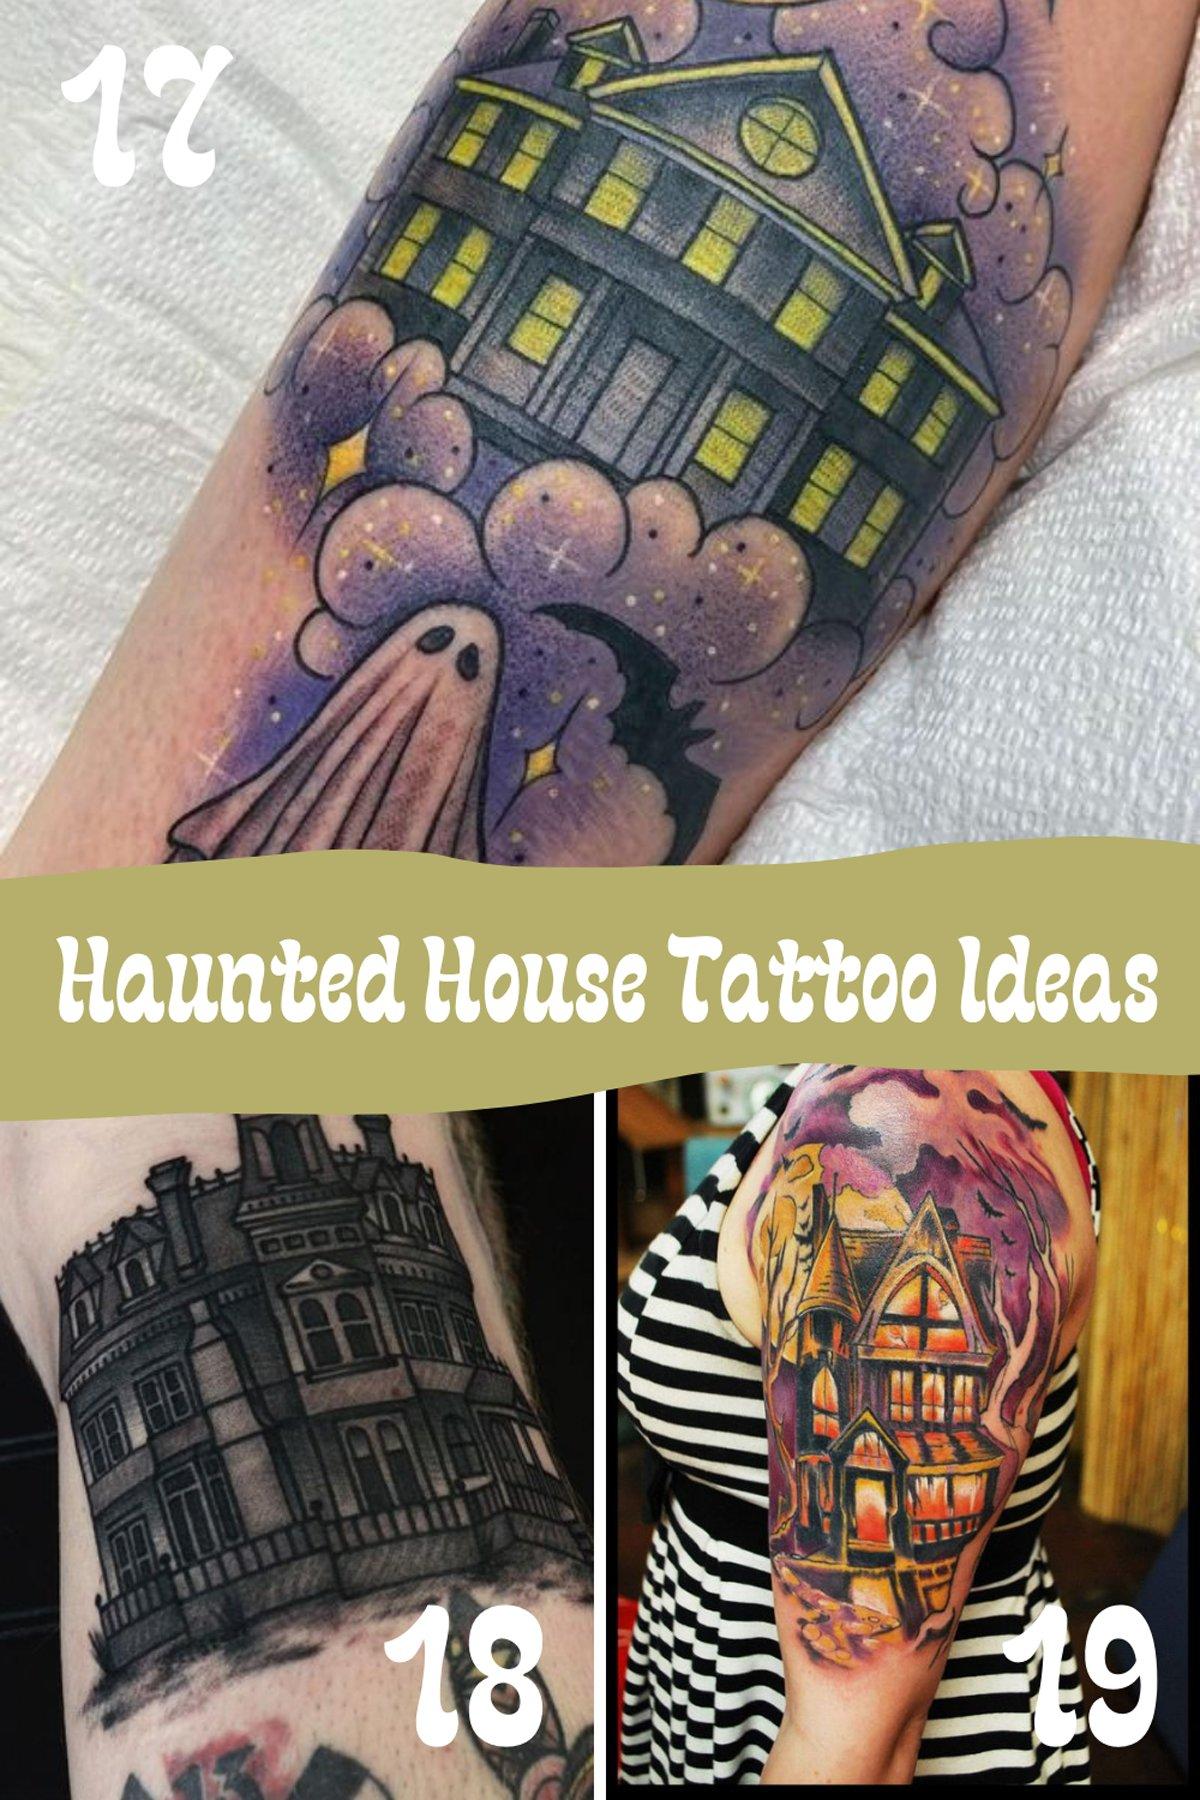 Haunted House Tattoo Ideas